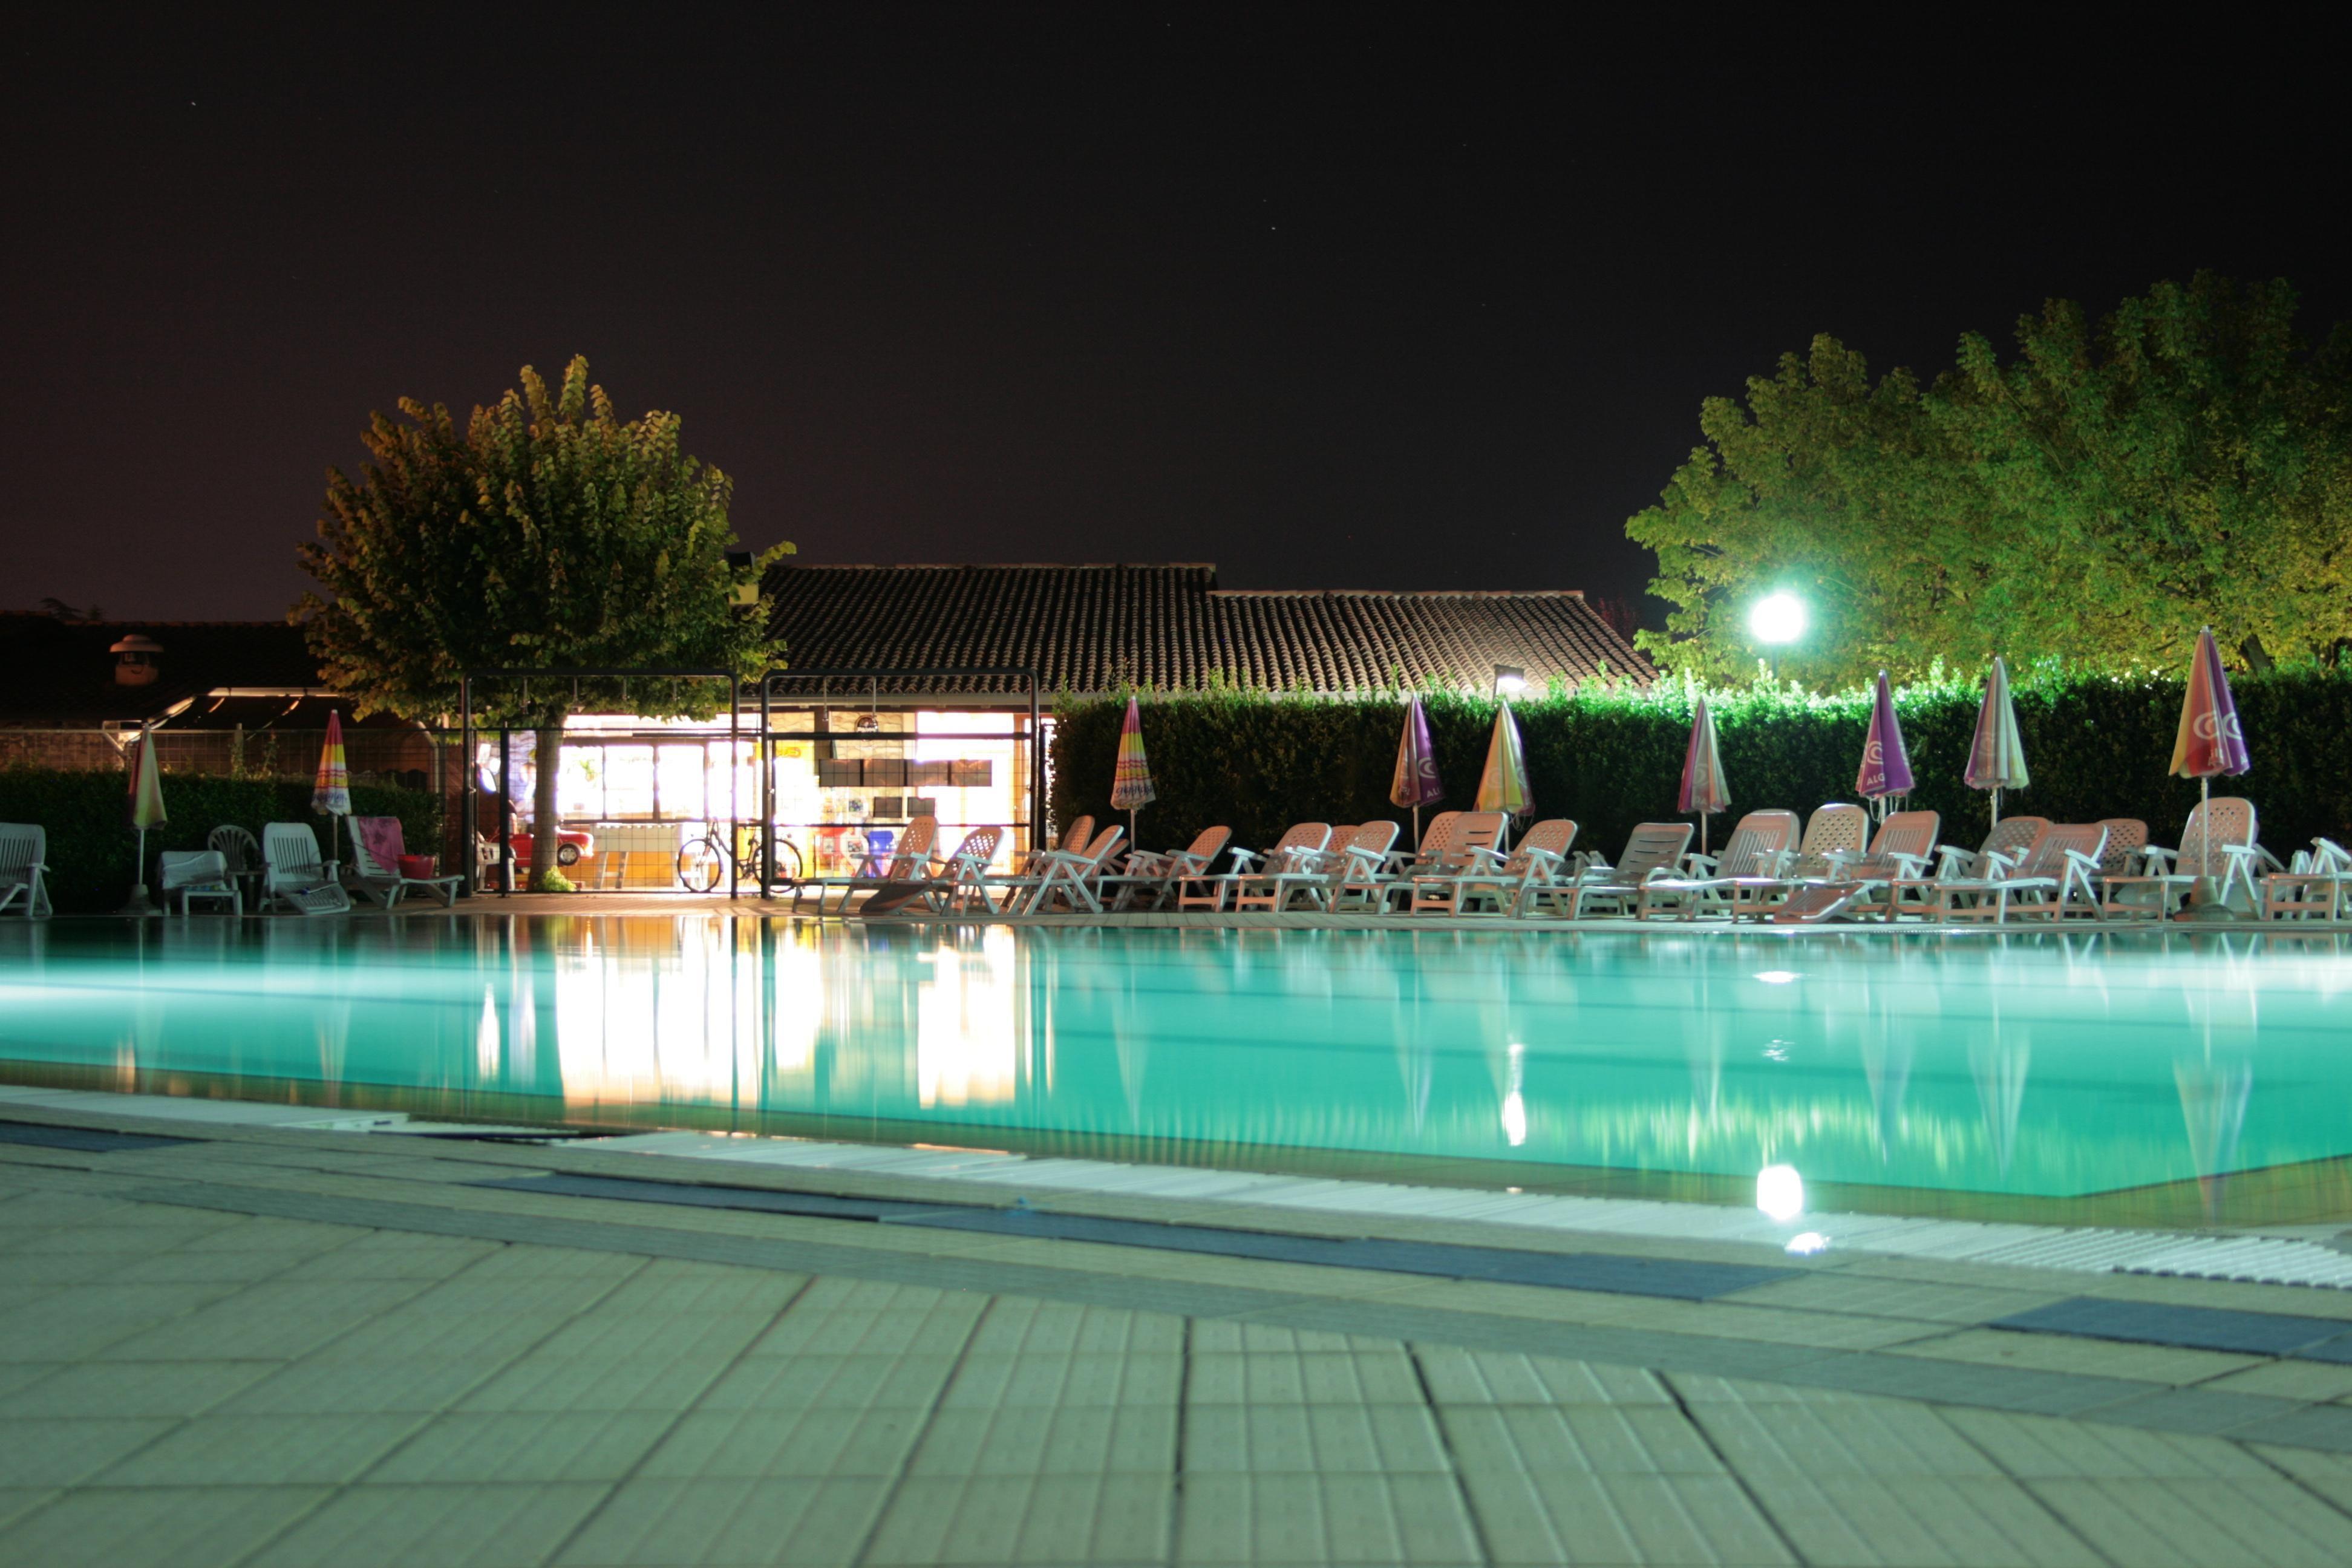 Zwembad in de avond bij camping Tiglio